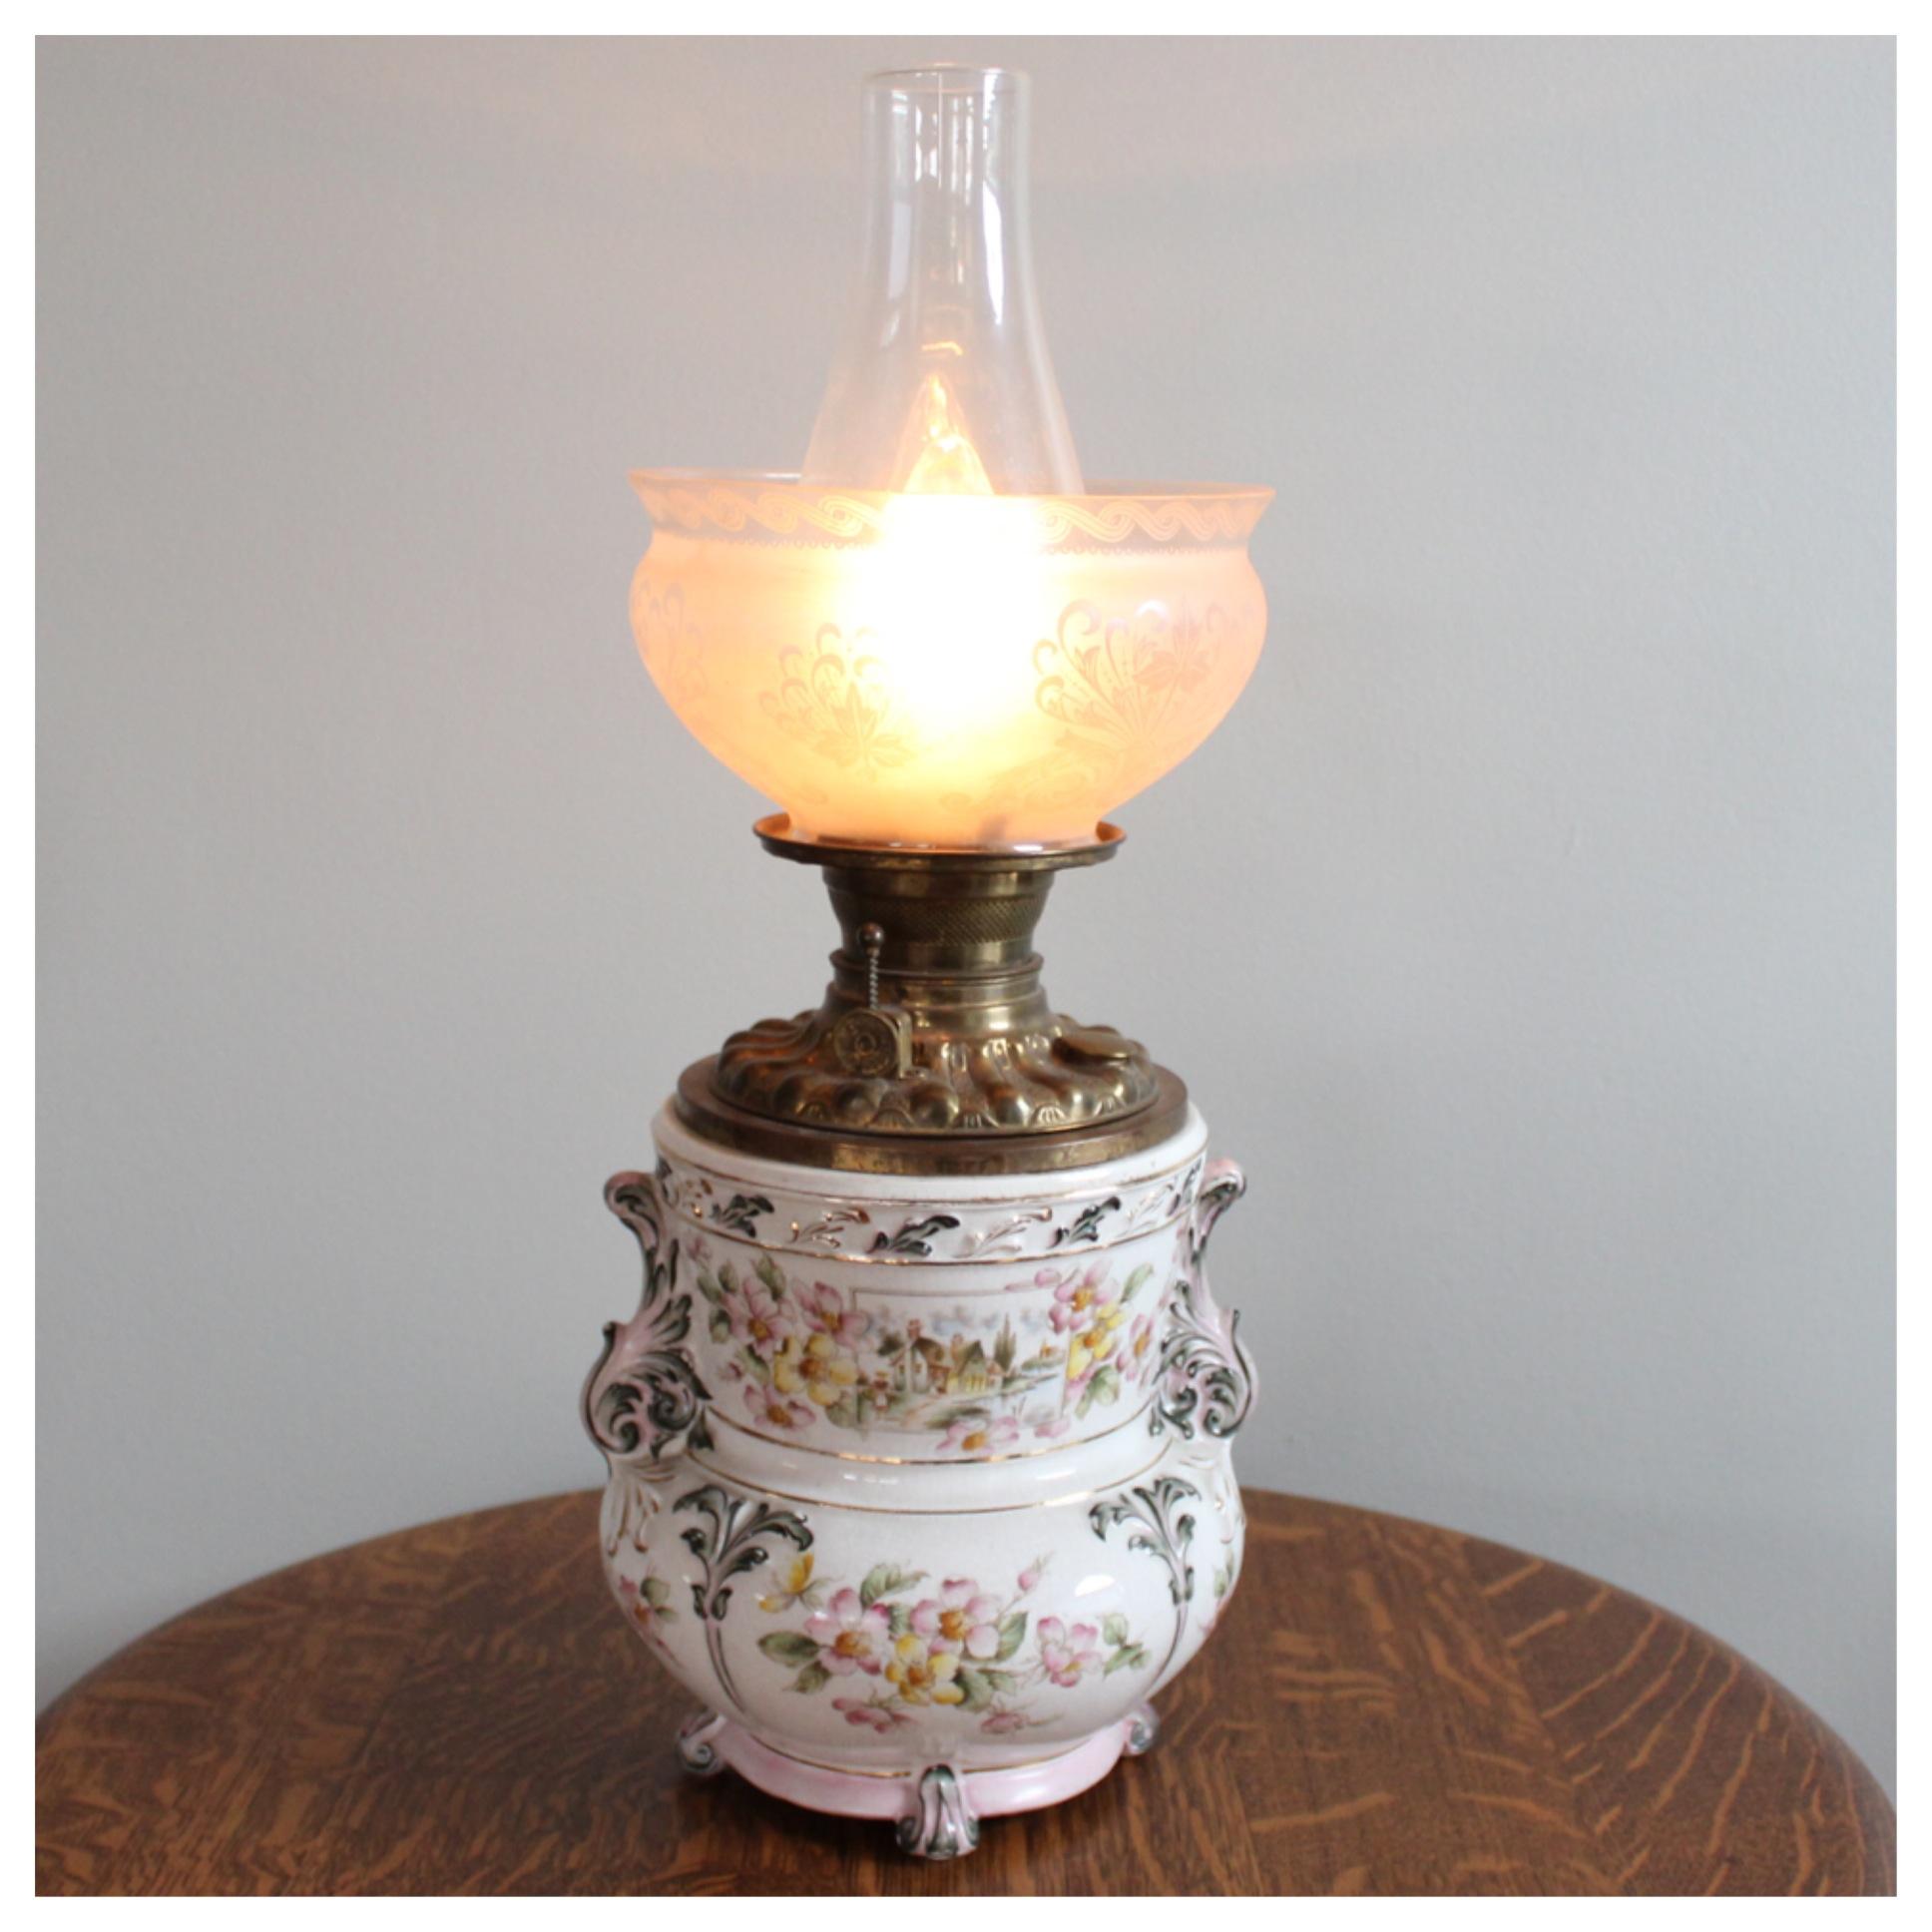 A1774 Pottery Table Lamp Bogart Bremmer Amp Bradley Antiques